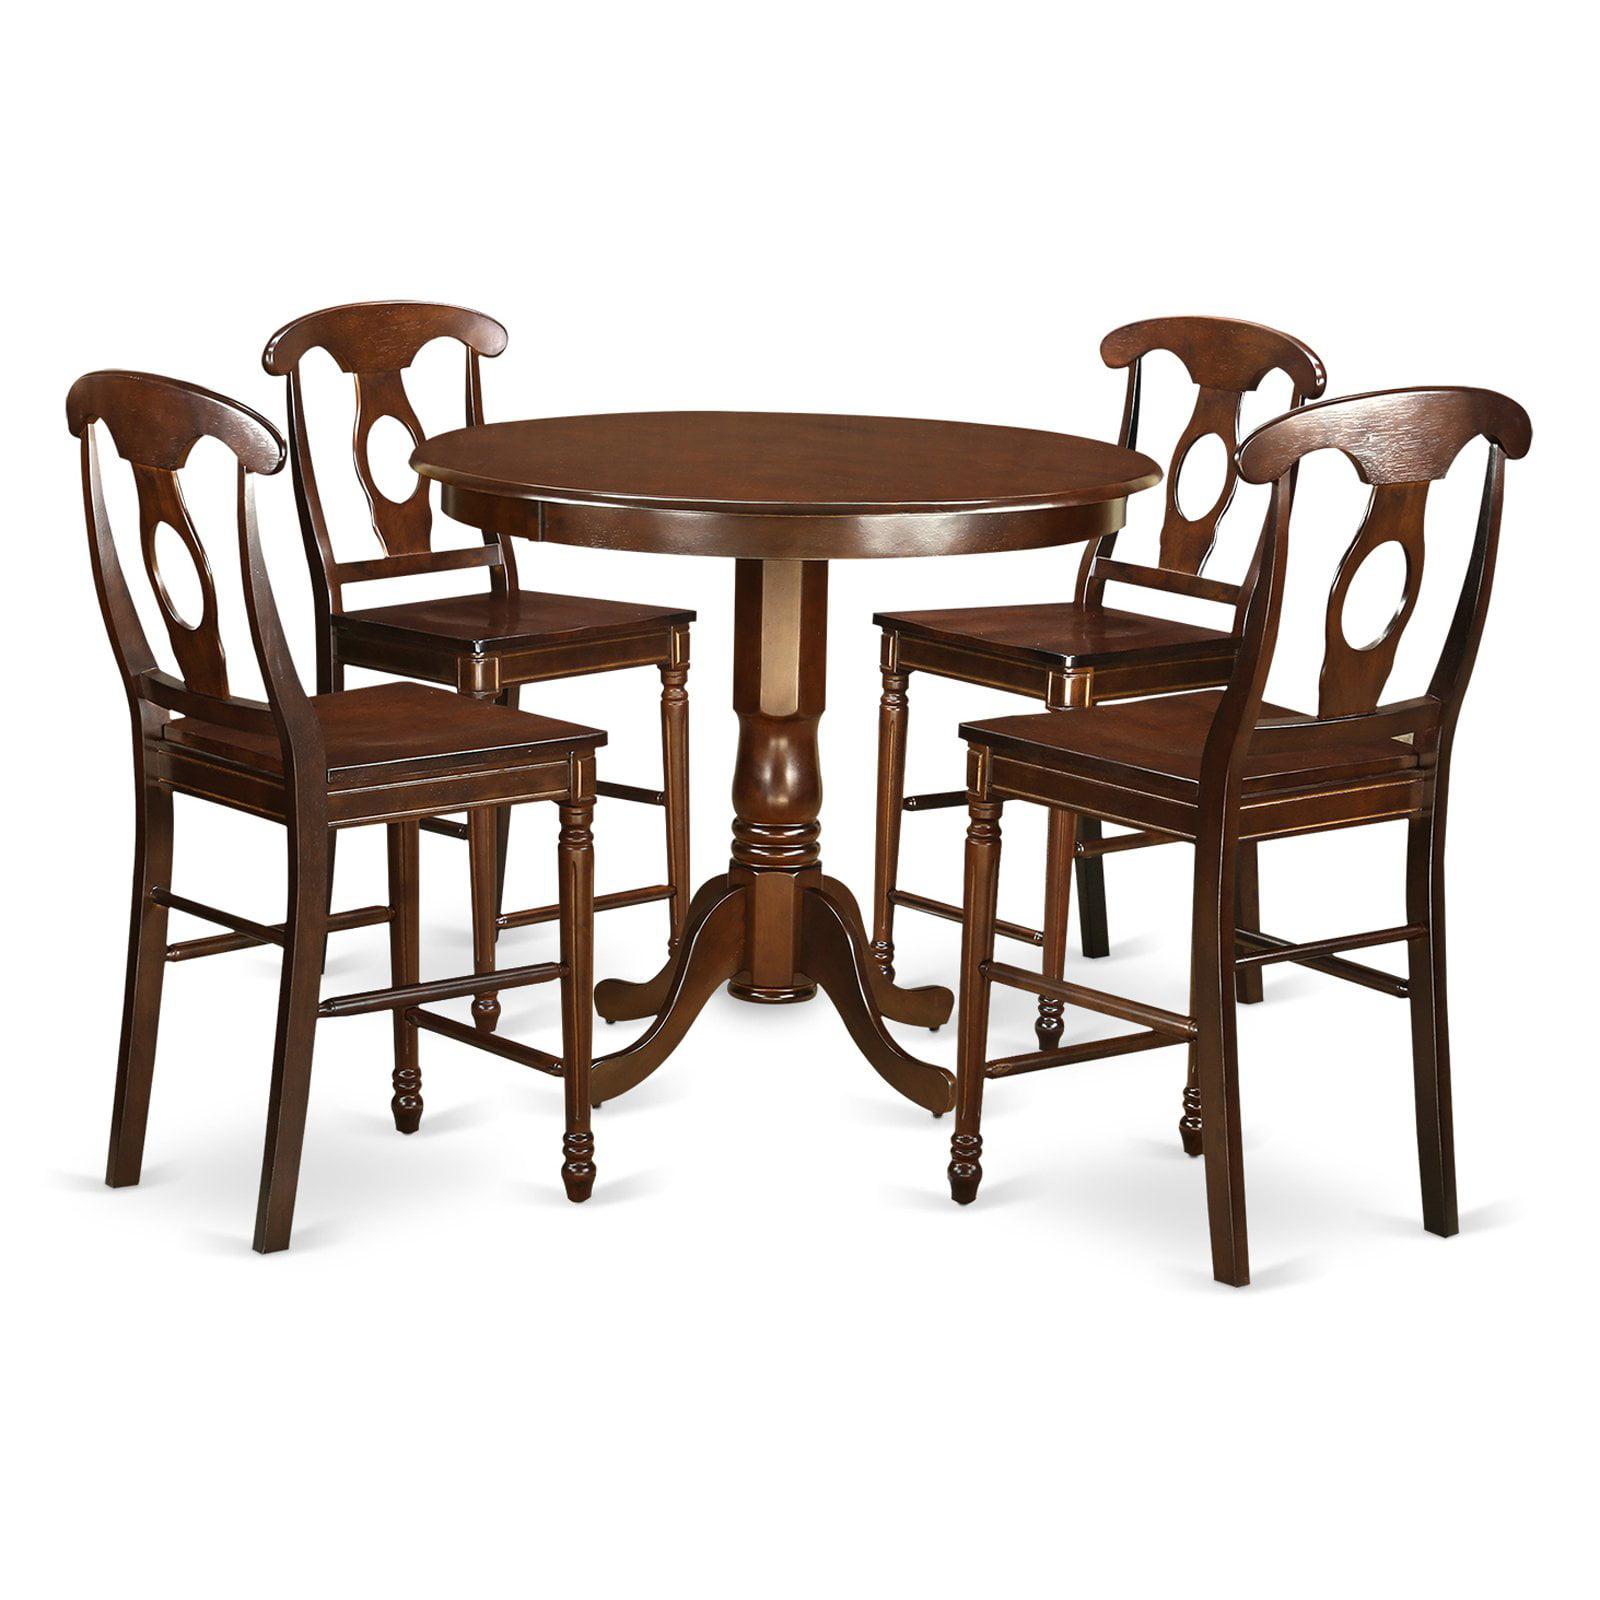 East West Furniture Trenton 5 Piece Keyhole Dining Table Set